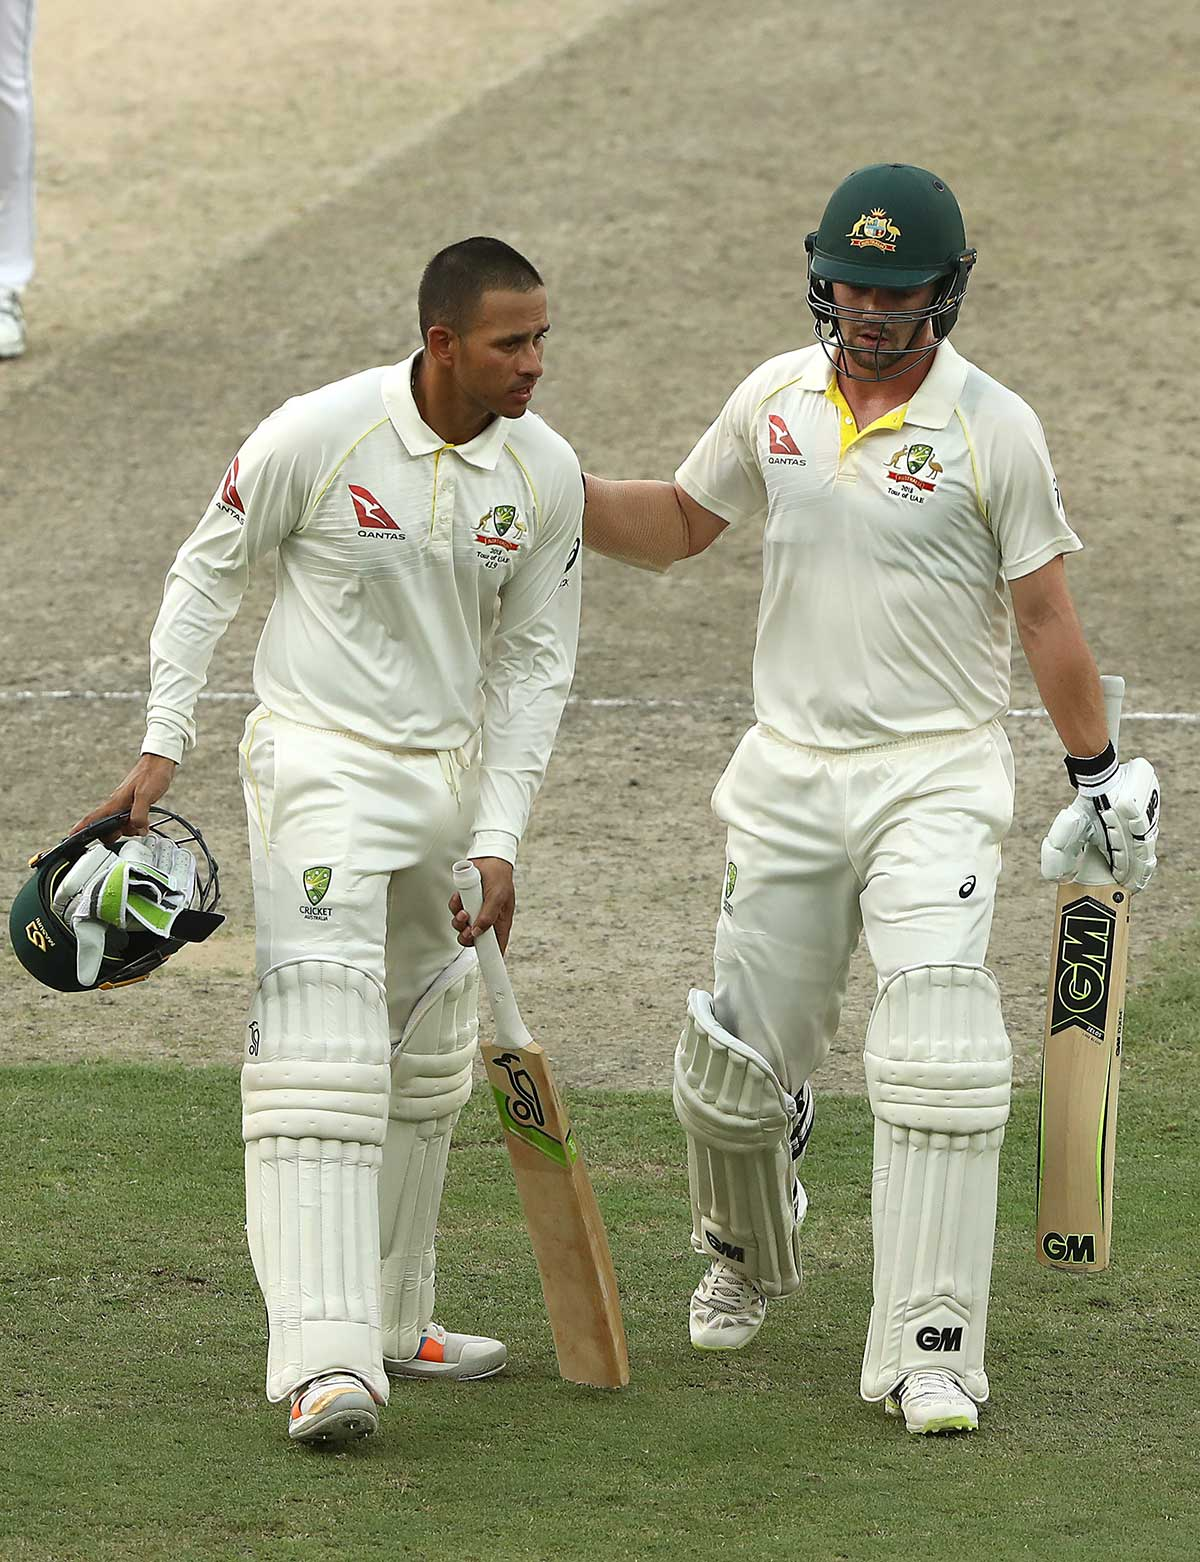 Khawaja and Head saw Australia to stumps // Getty